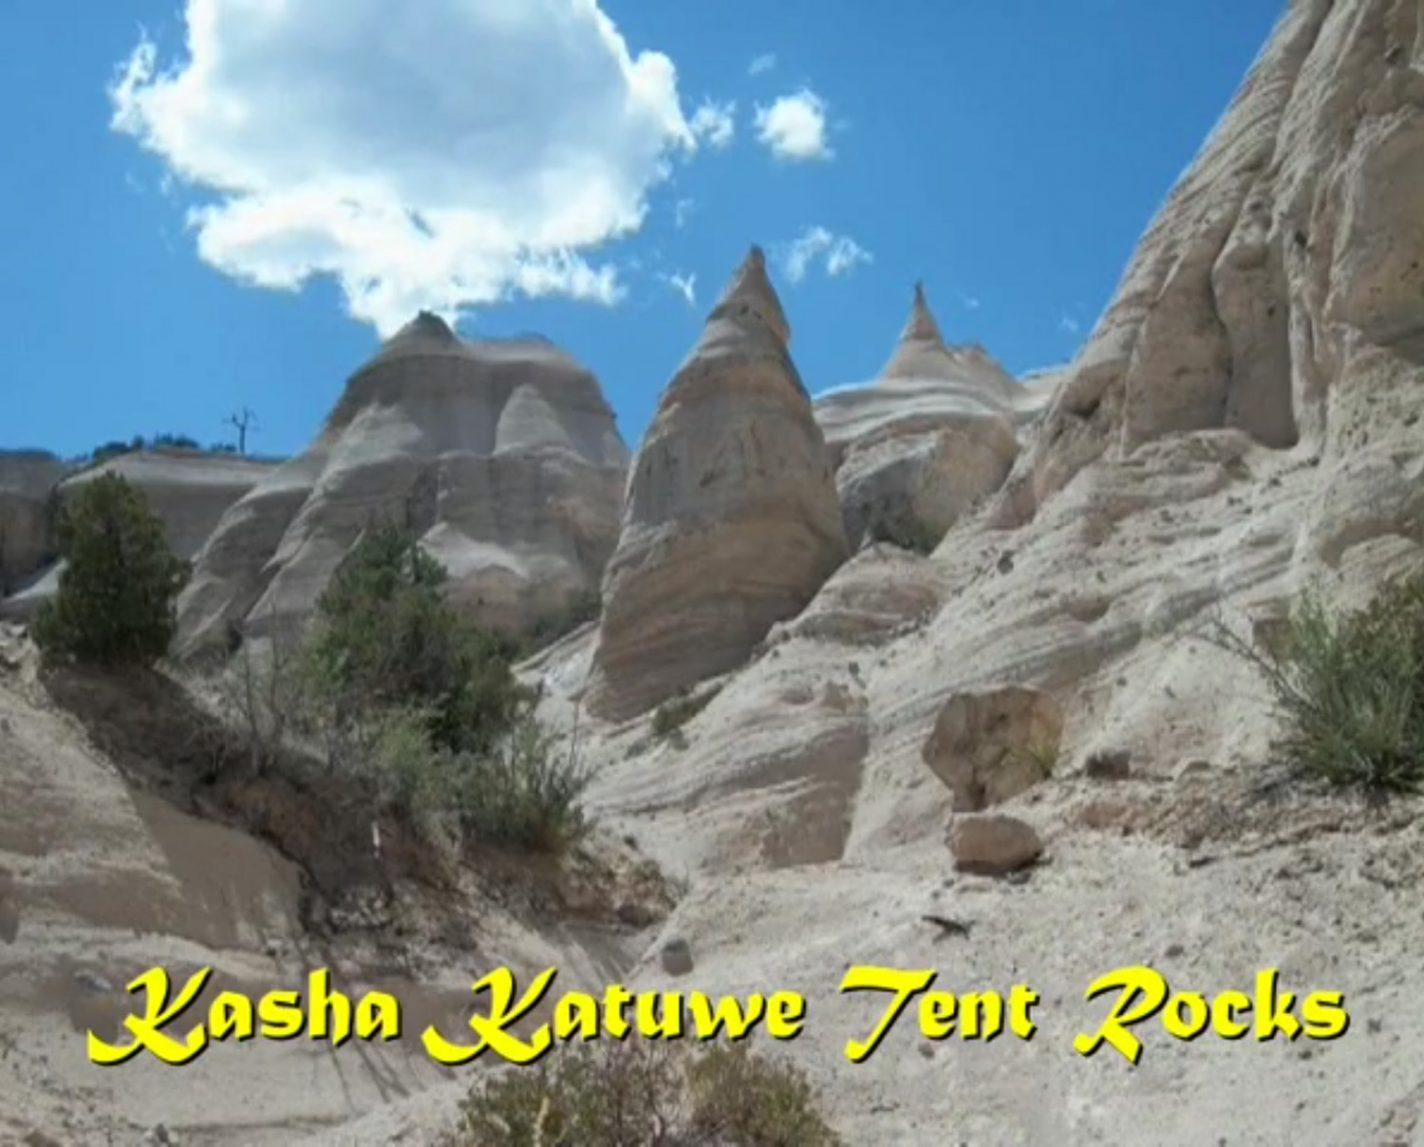 Kasha Tent Rocks